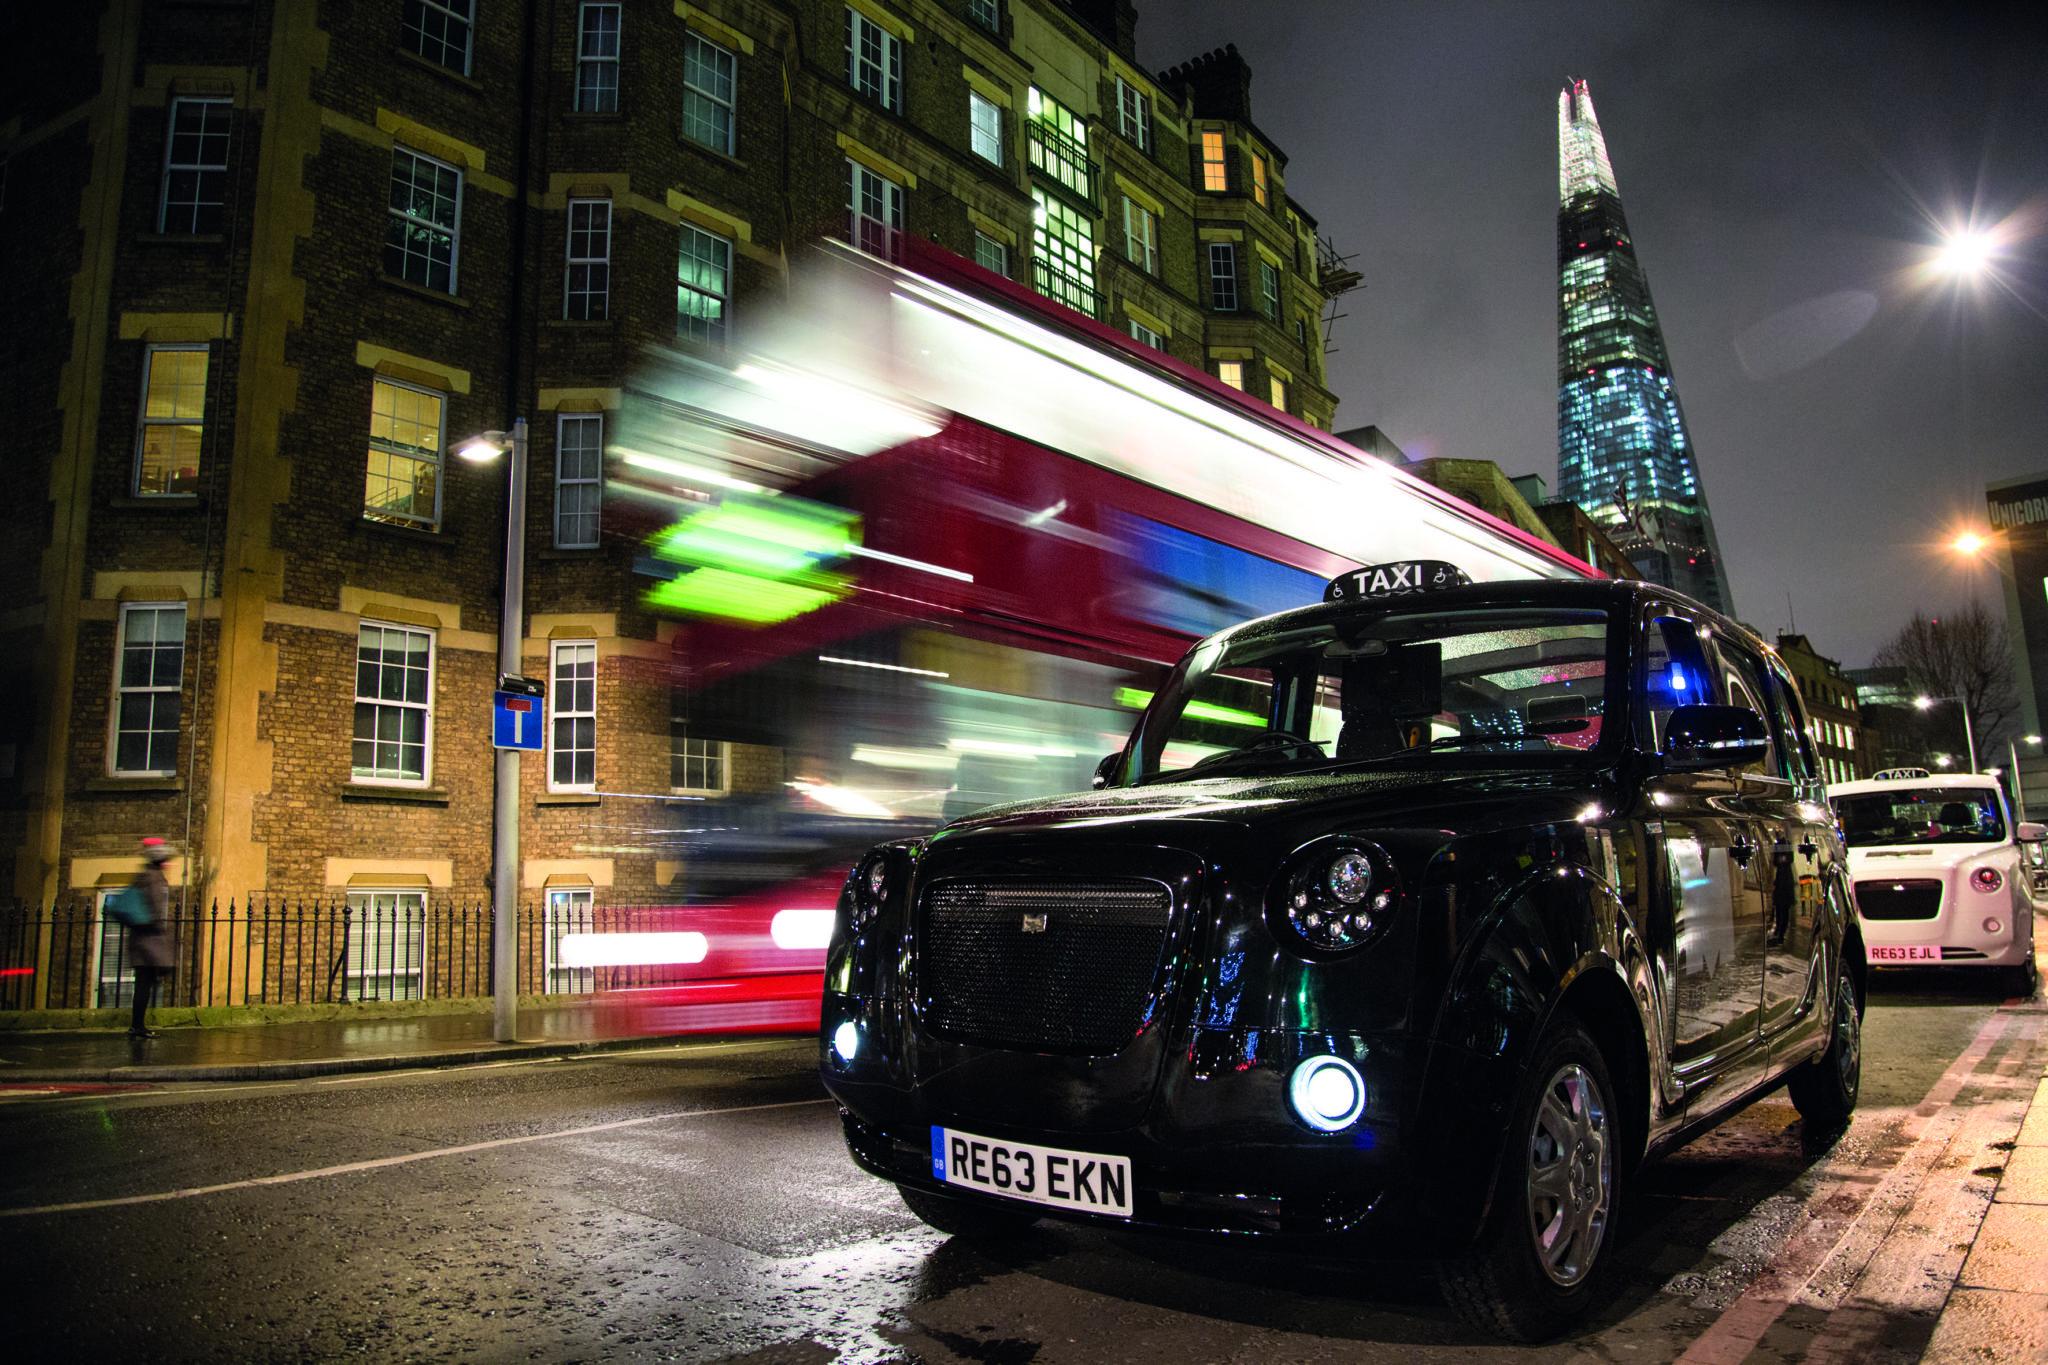 Night lights queens walk london - 10 Tower Bridge